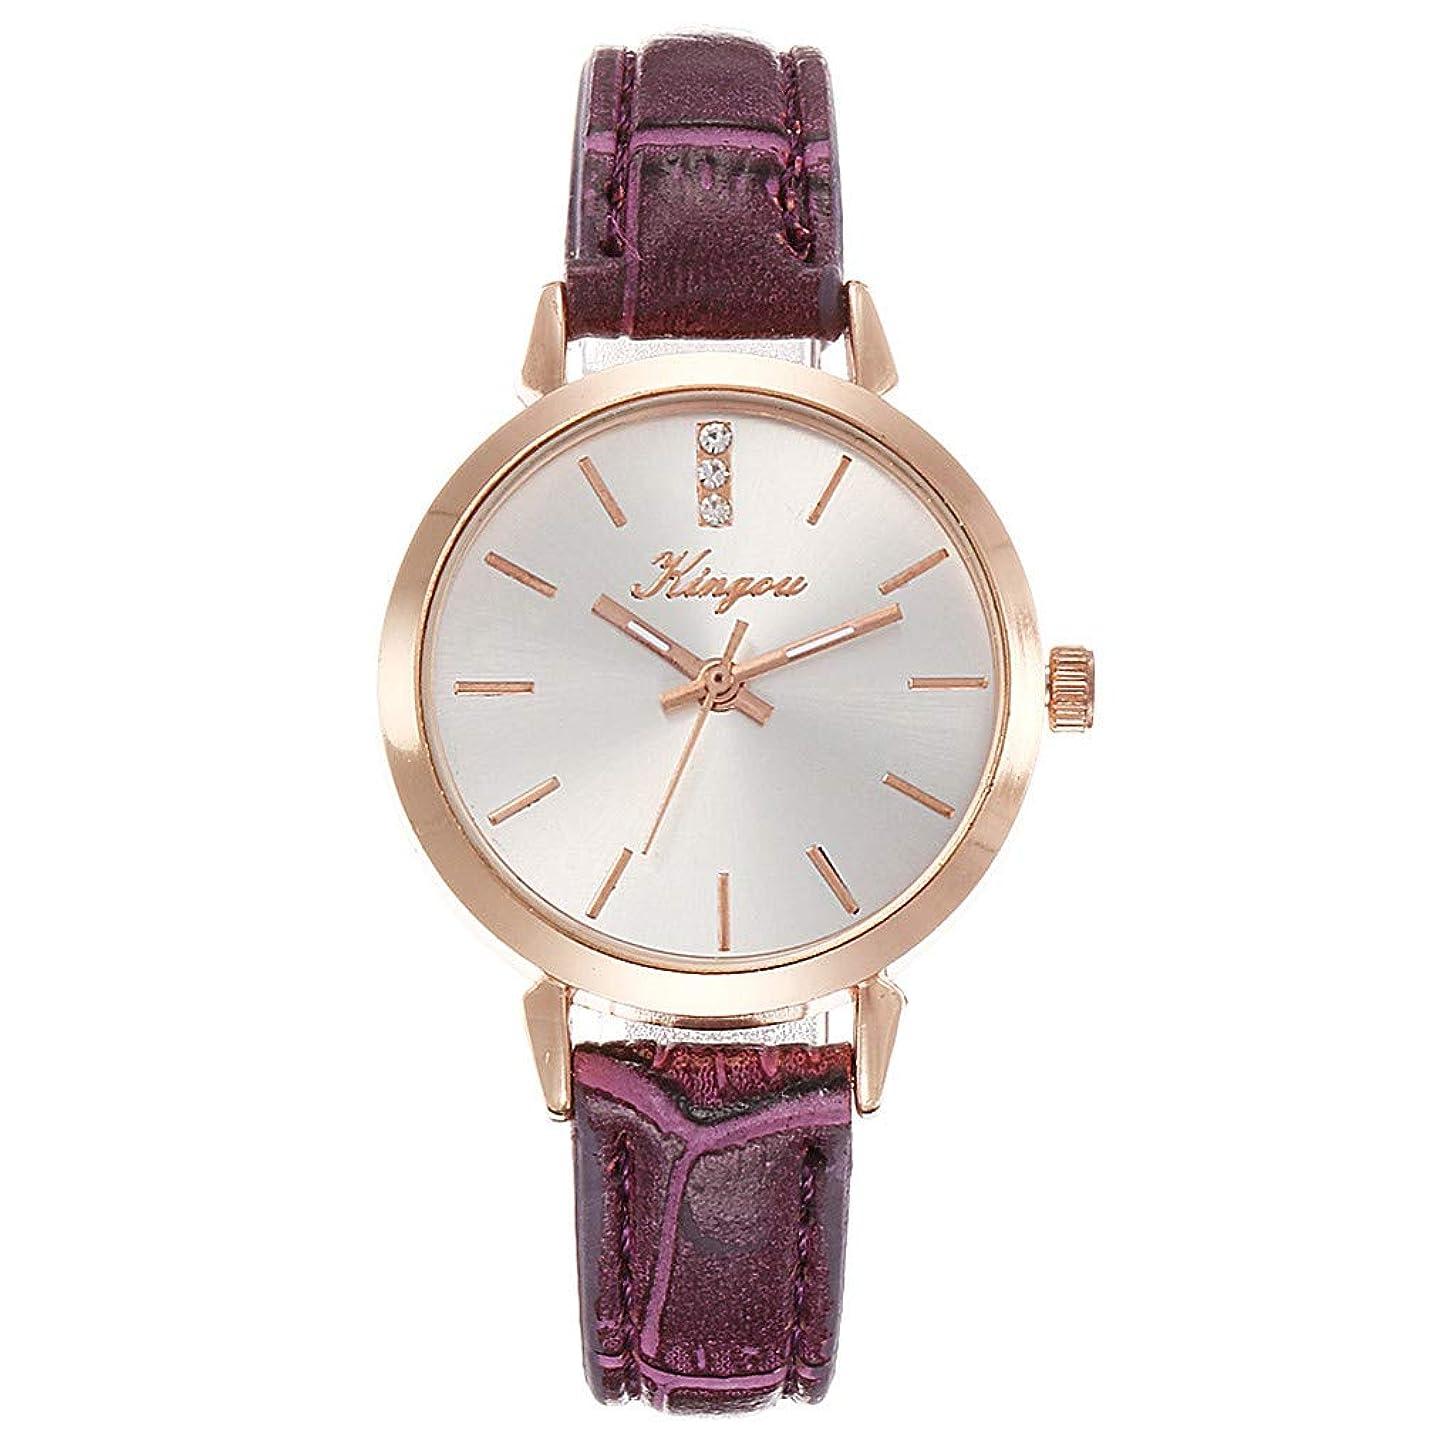 LUCAMORE Women's Quartz Wrist Watch Classic Business Casual Fashion Analog Wrist Watch PU Leather Watch